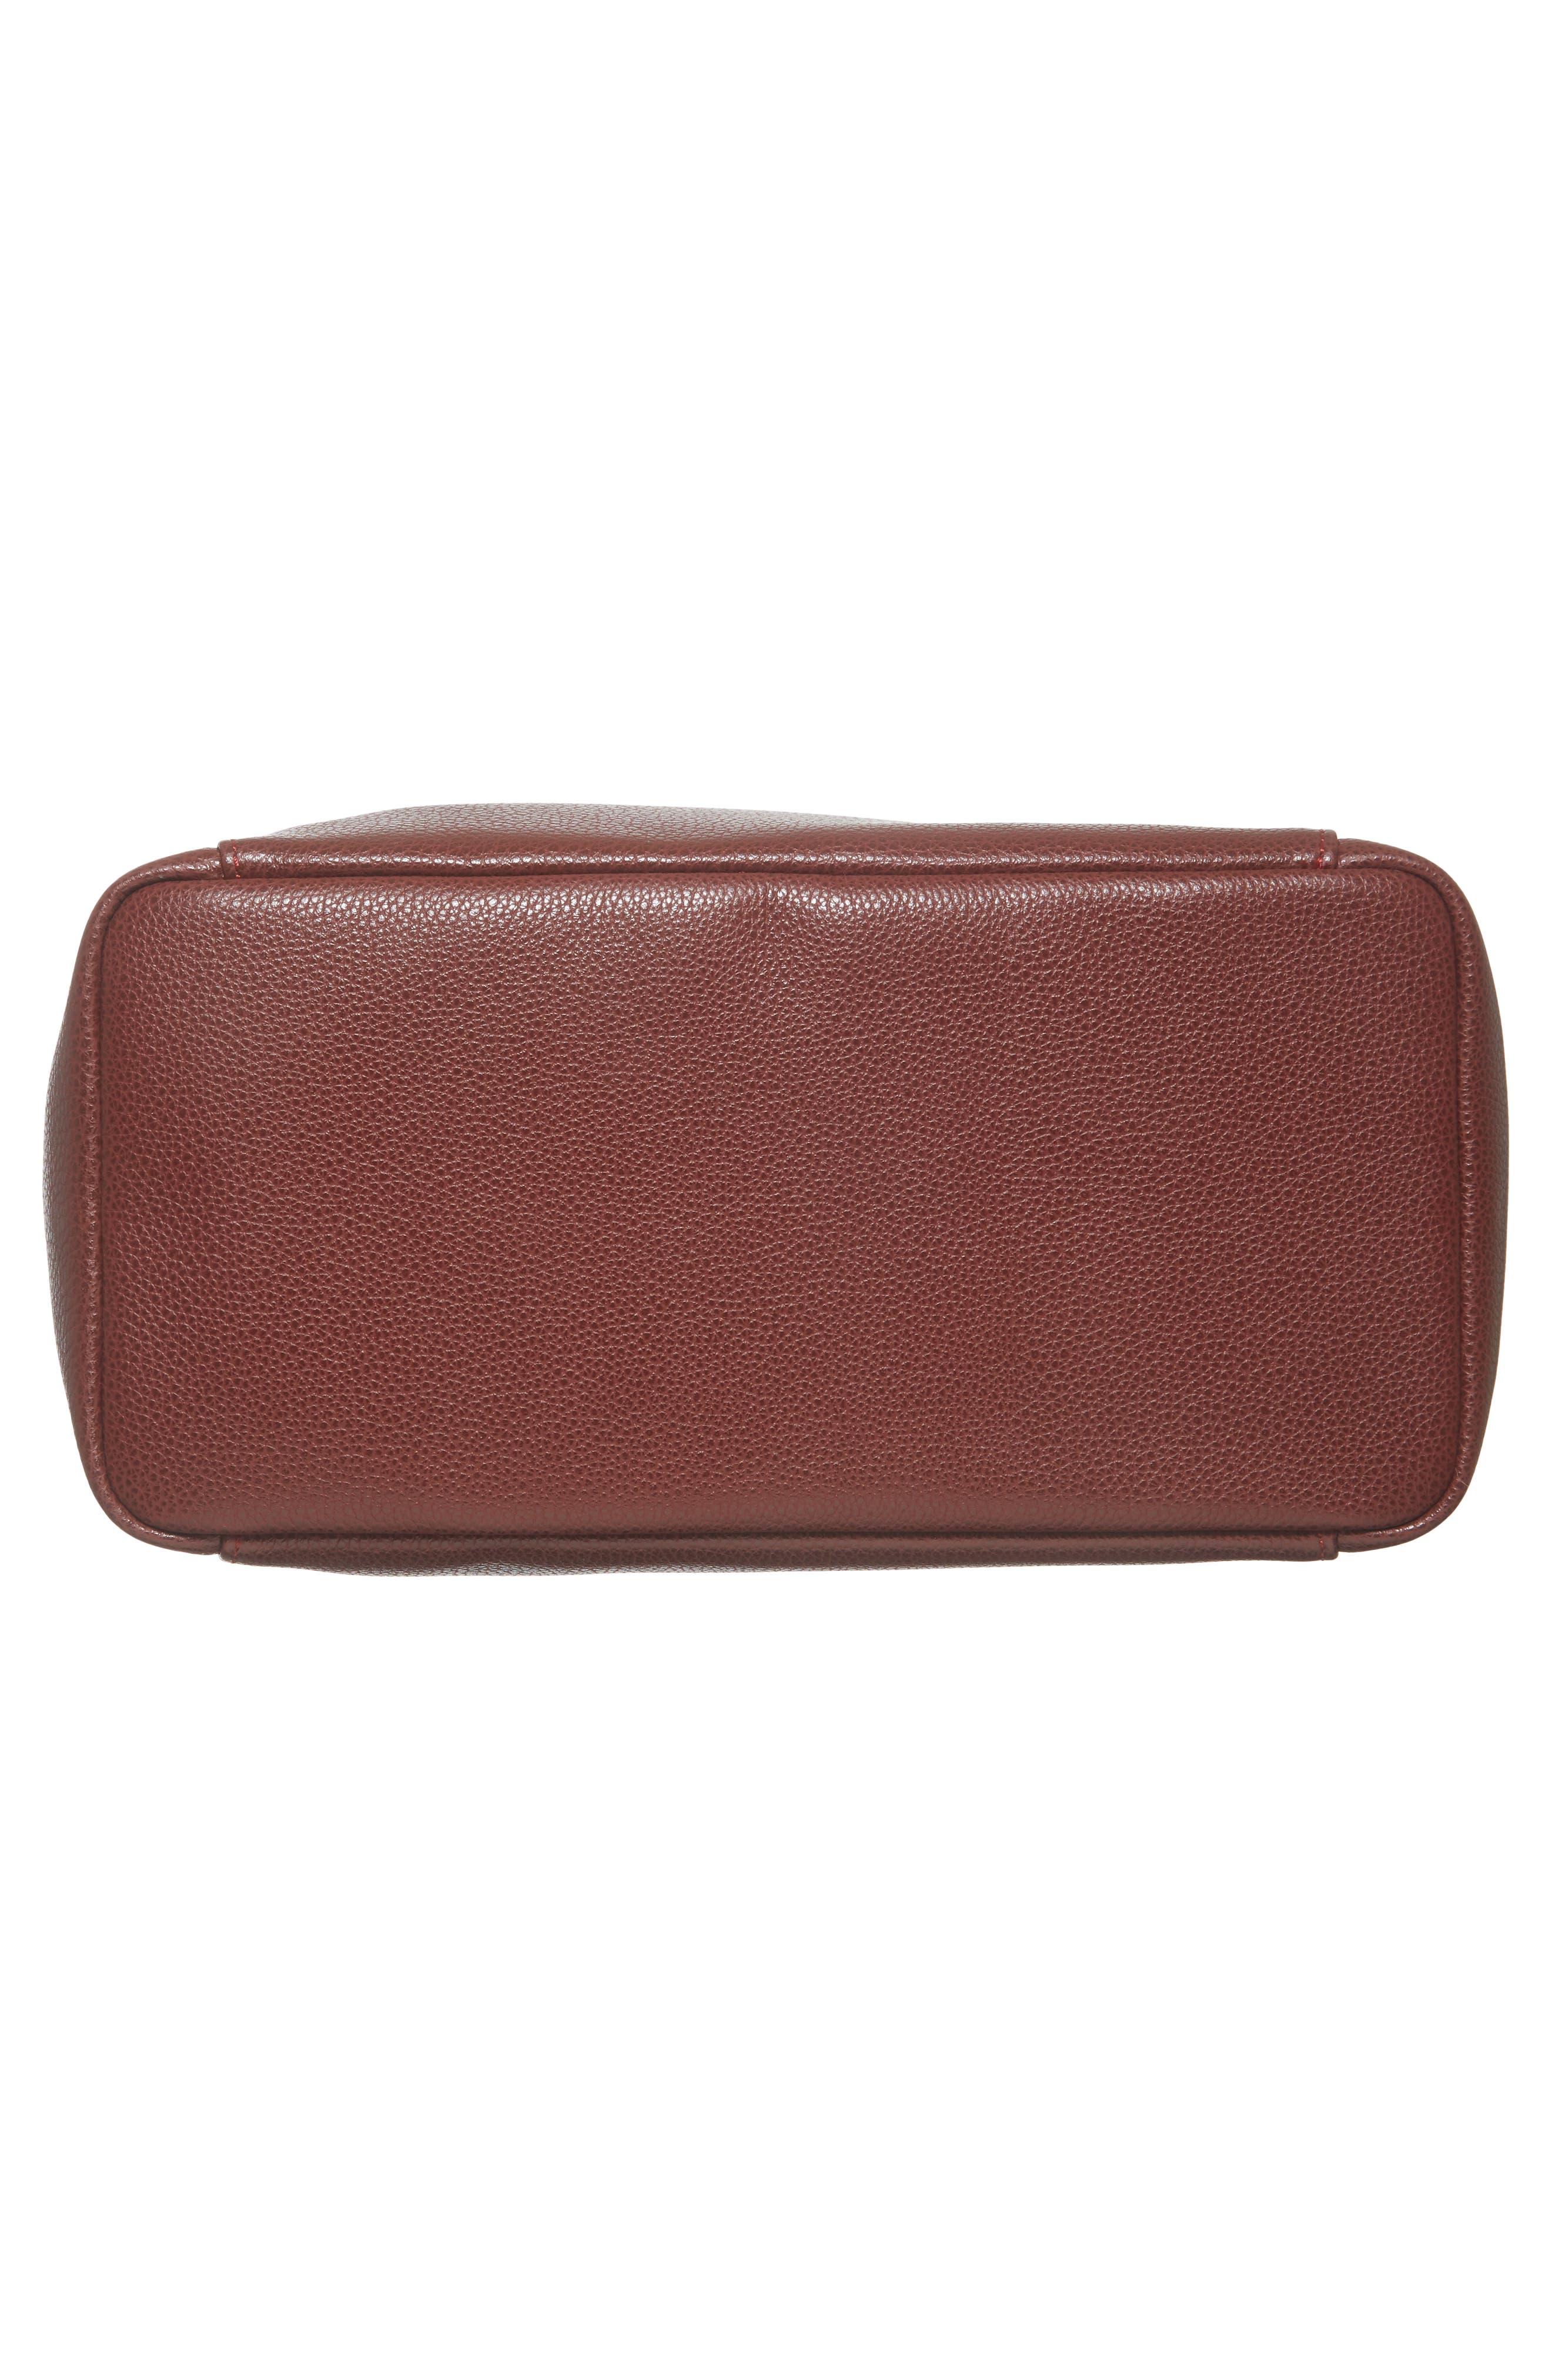 'Le Foulonne' Leather Hobo Bag,                             Alternate thumbnail 6, color,                             618